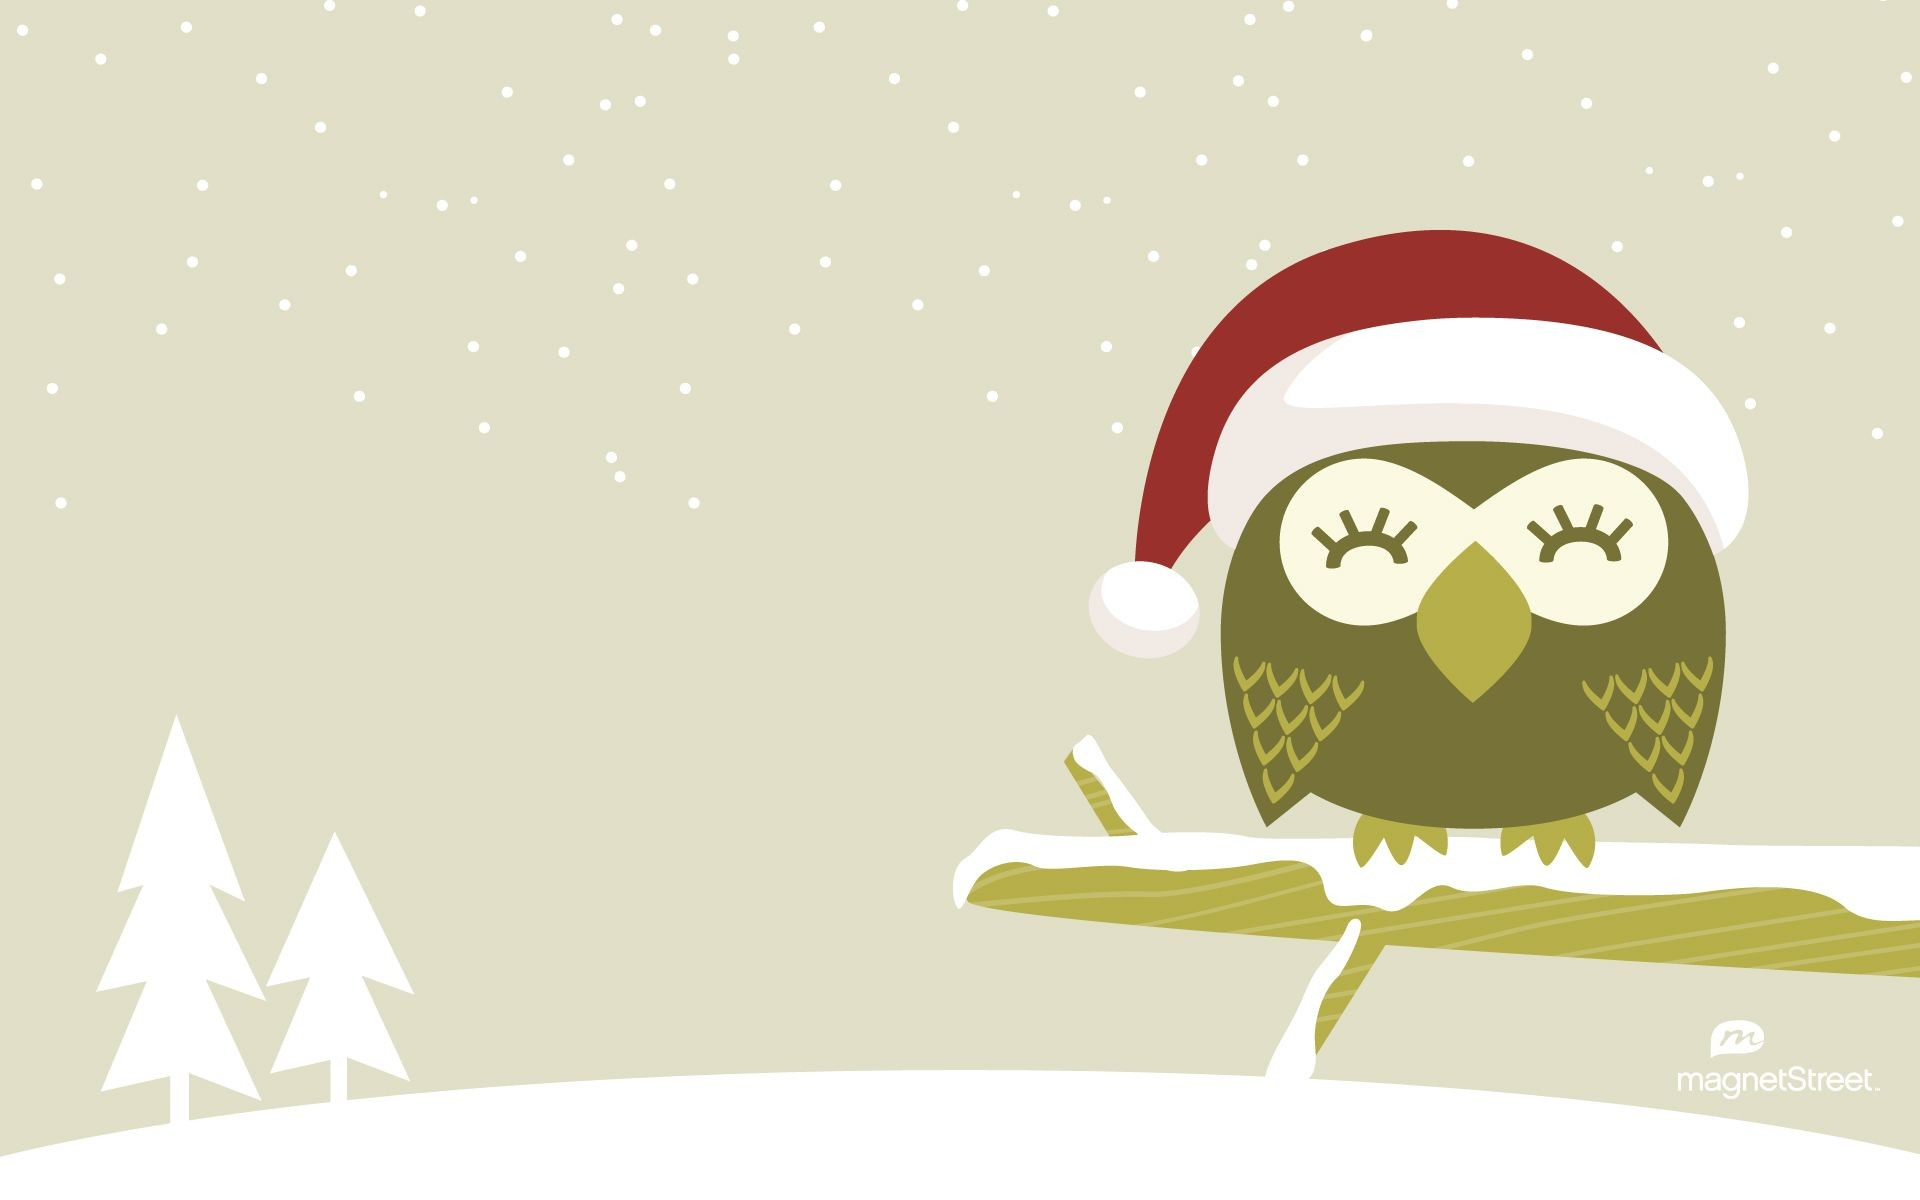 Res: 1920x1200, Wallpapers For > Cute Owl Desktop Wallpaper Hd